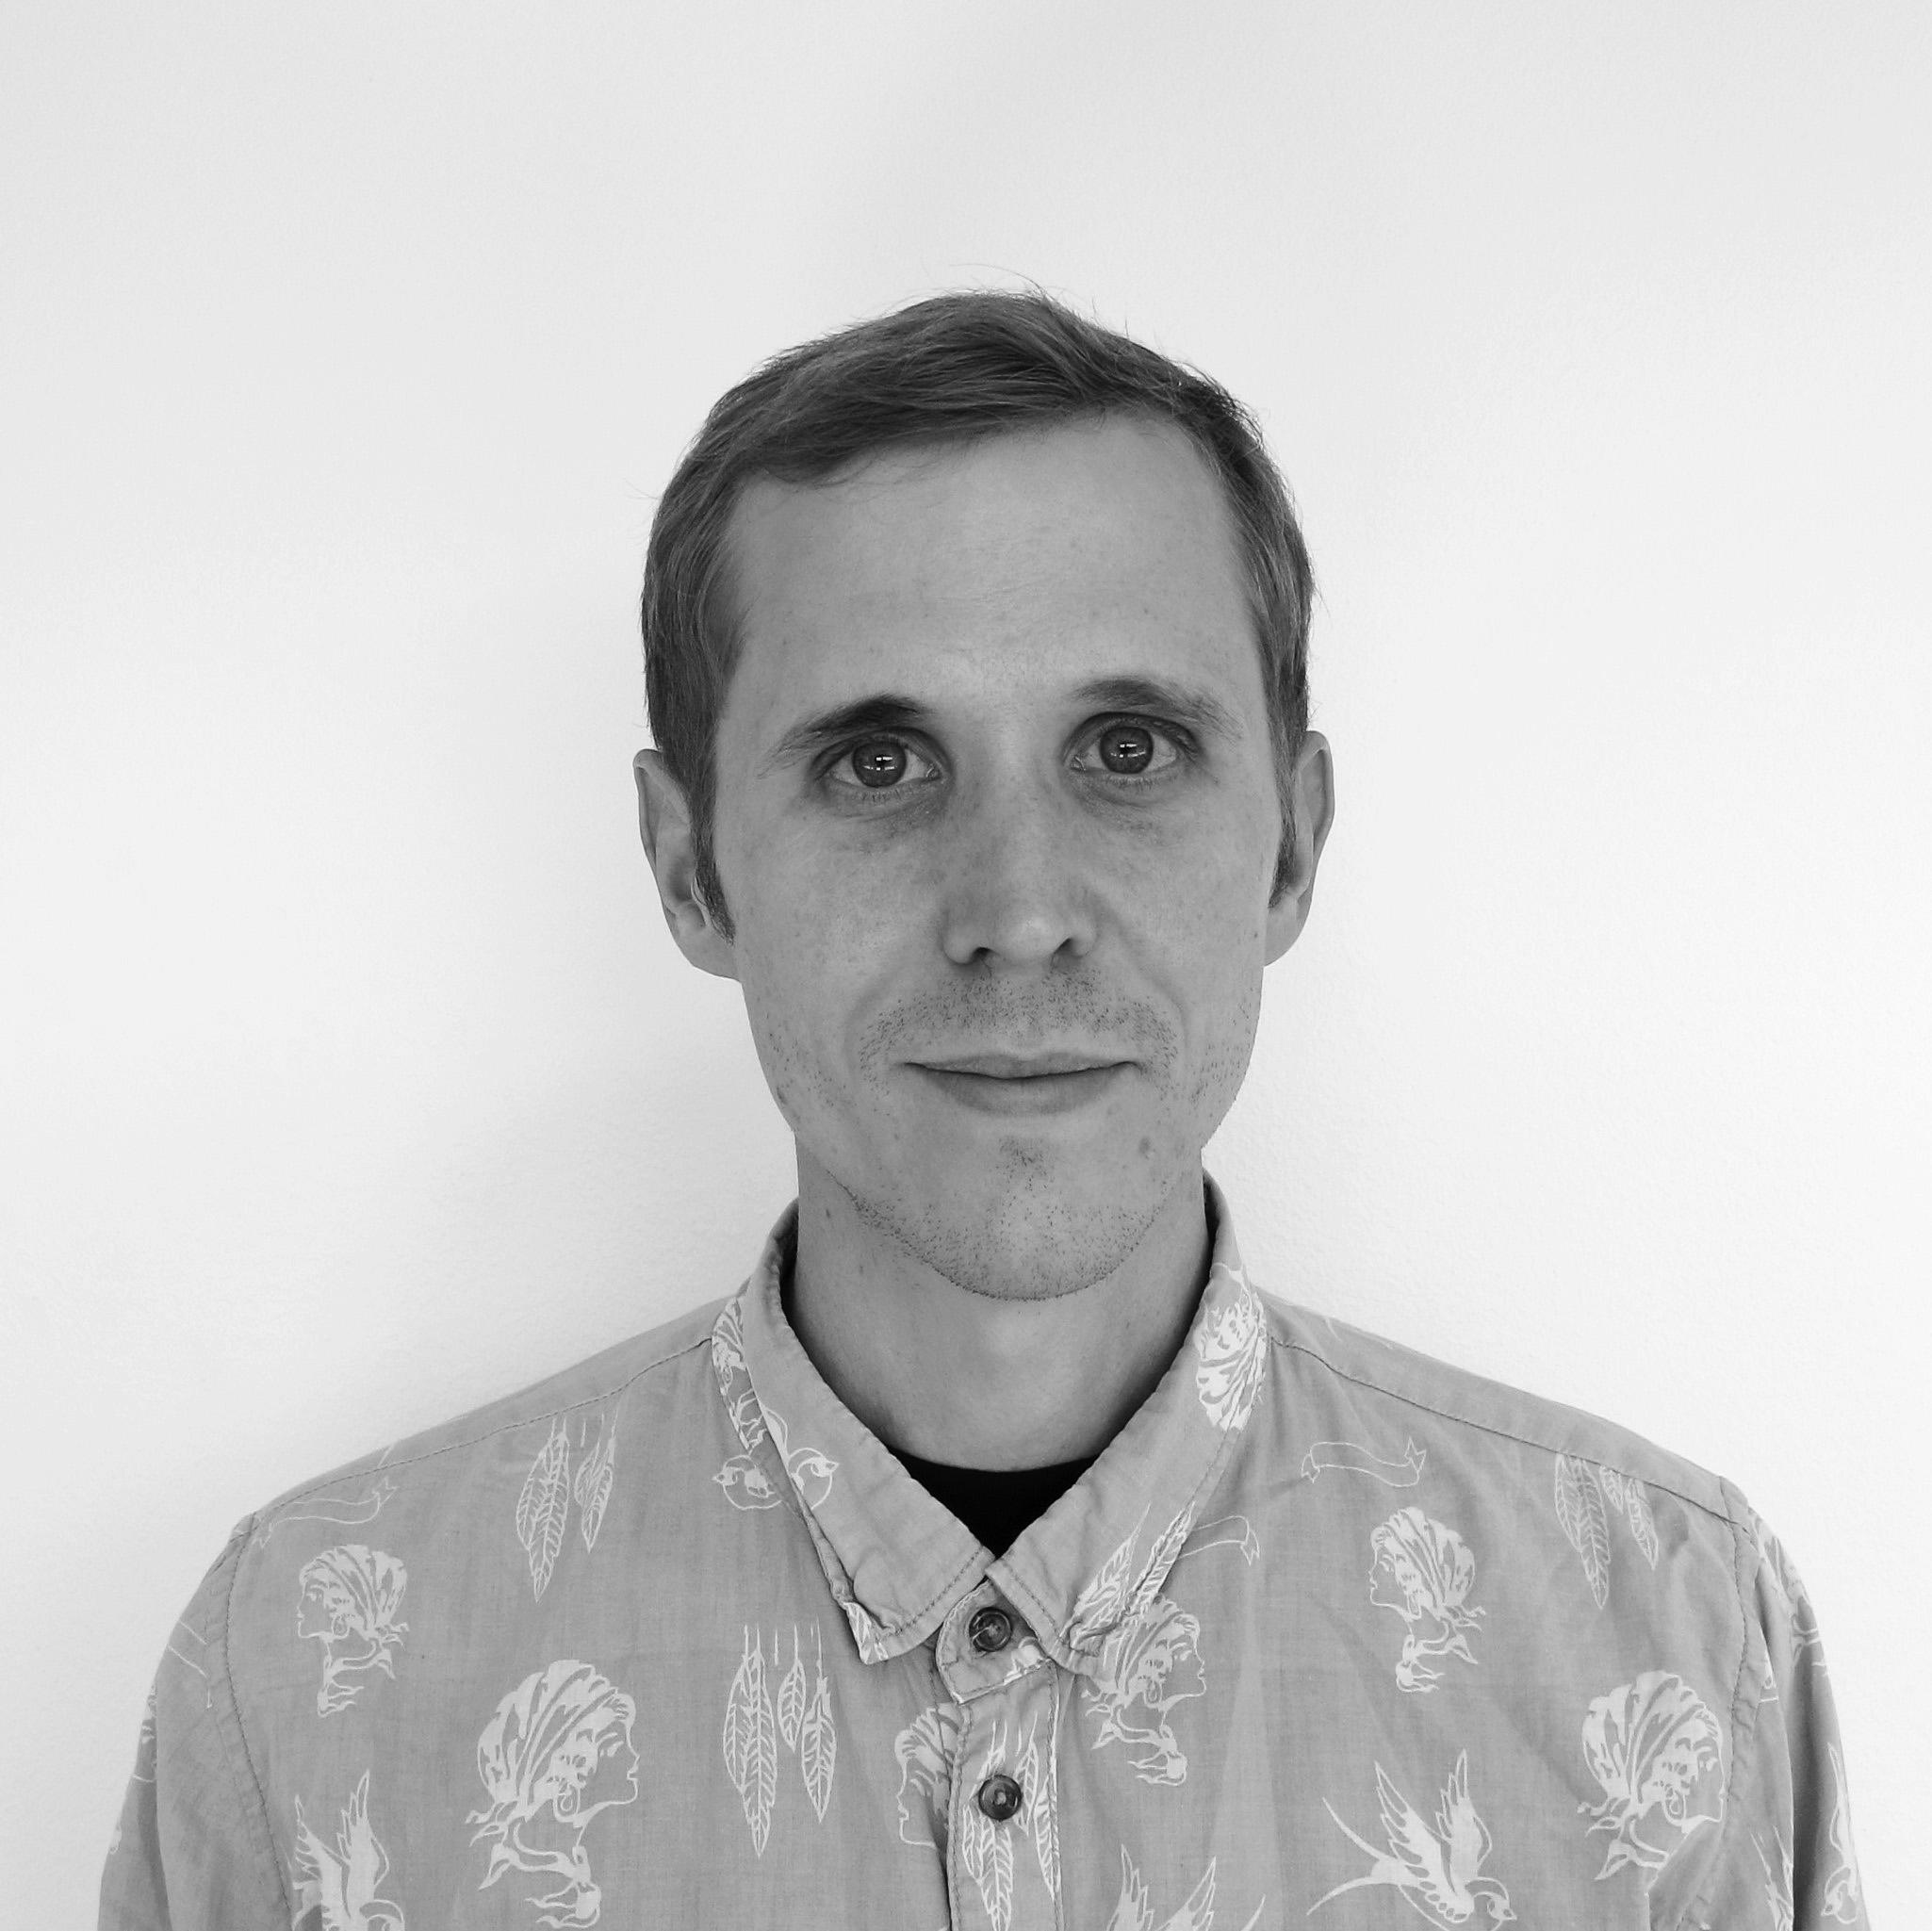 Patrick Hernvall